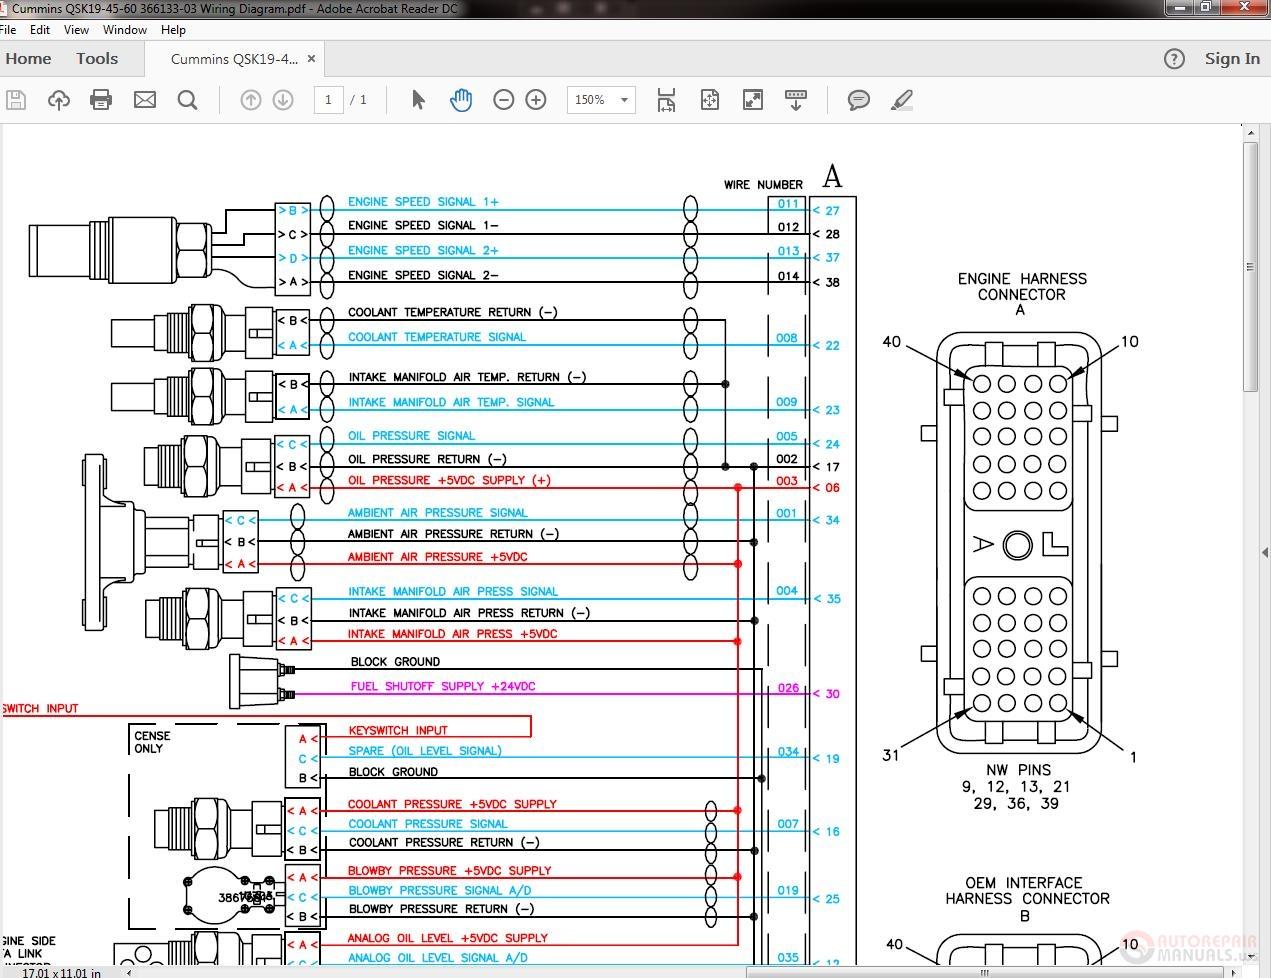 Cummins Qsk19-45-60 366133-03 Wiring Diagram